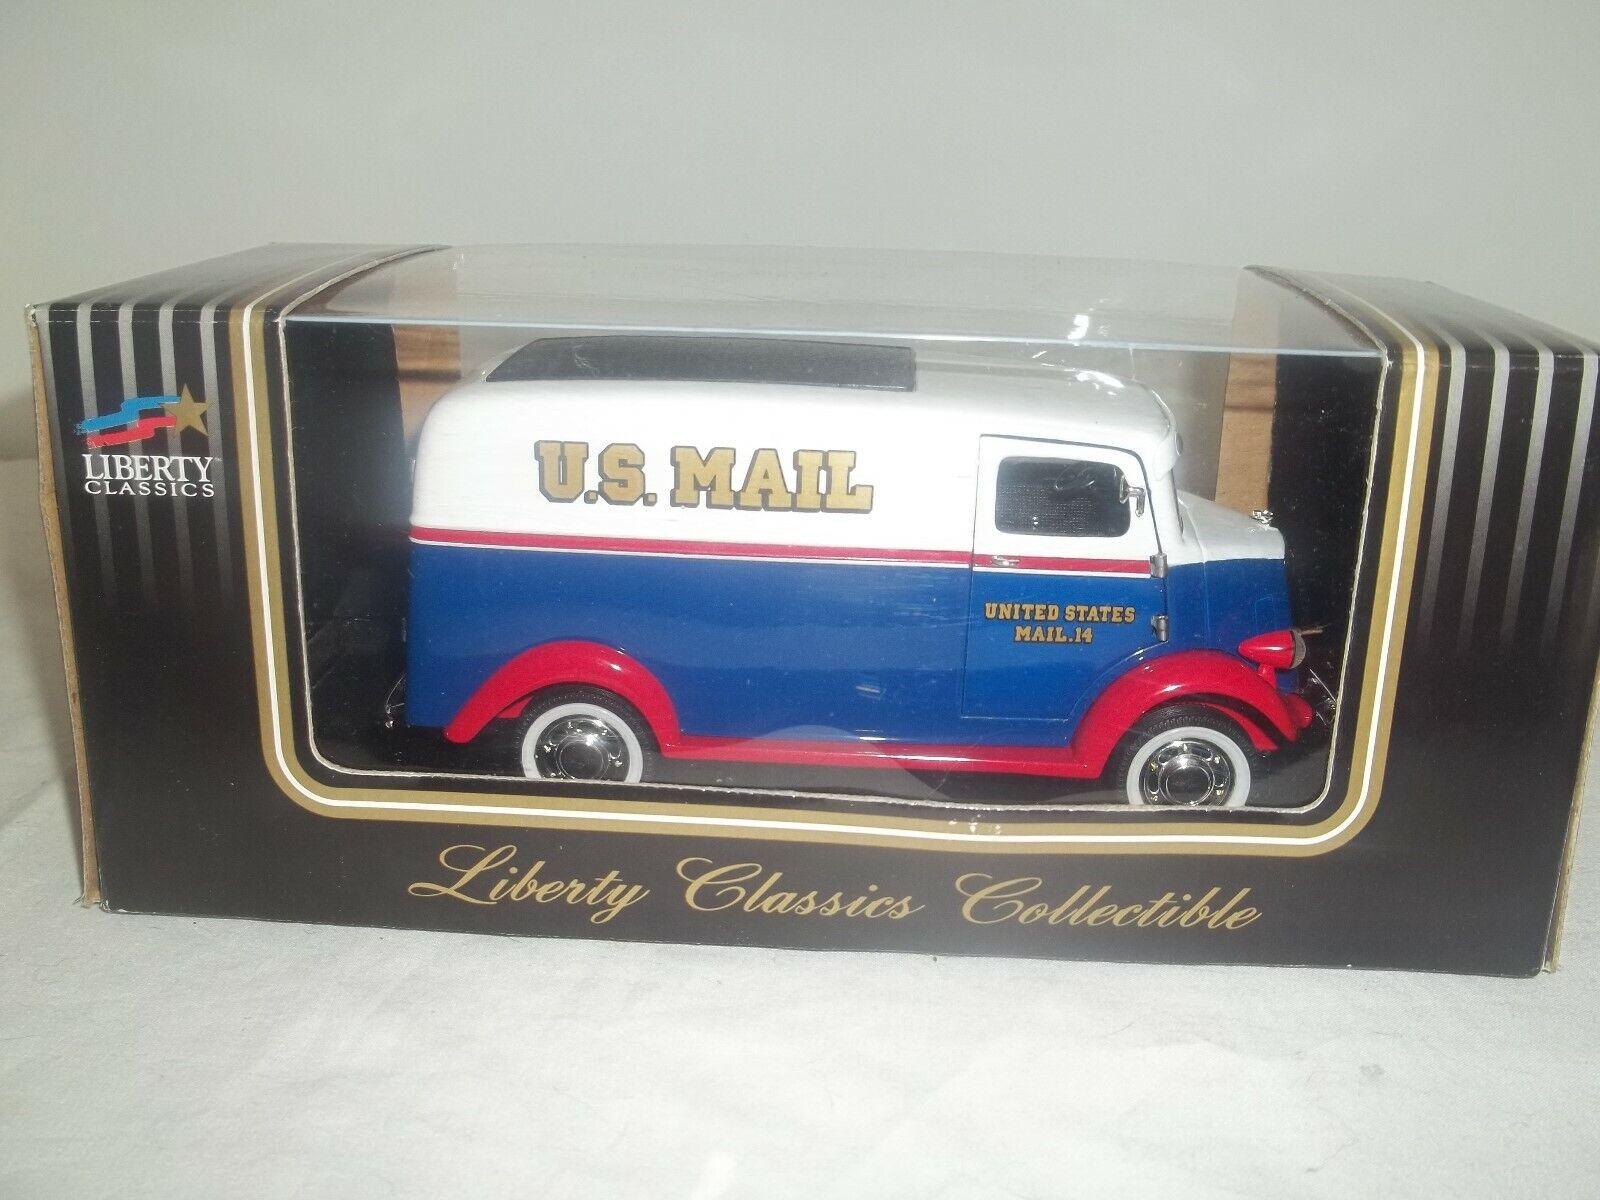 descuento de bajo precio Liberty Classics Classics Classics Coleccionable 20232 USPS 1938 Studebaker van 1 25 mint & boxed  se descuenta